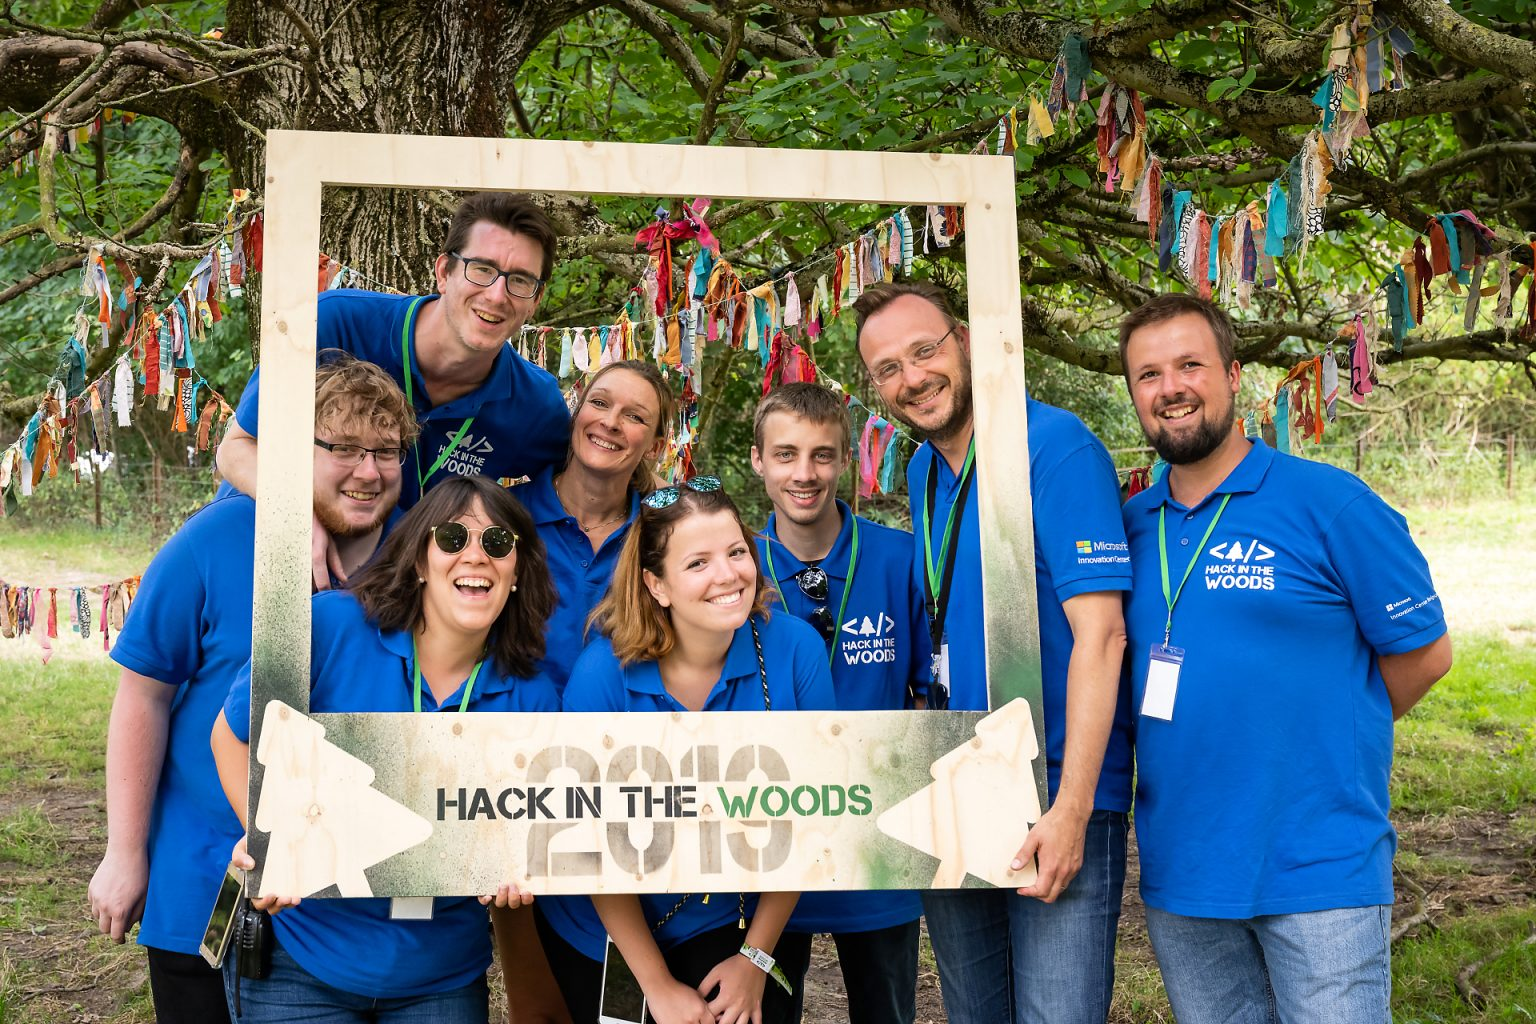 Equipe du Microsoft Innovation center, Hack in the Woods 2019 par Aurore Delsoir photographe corporate